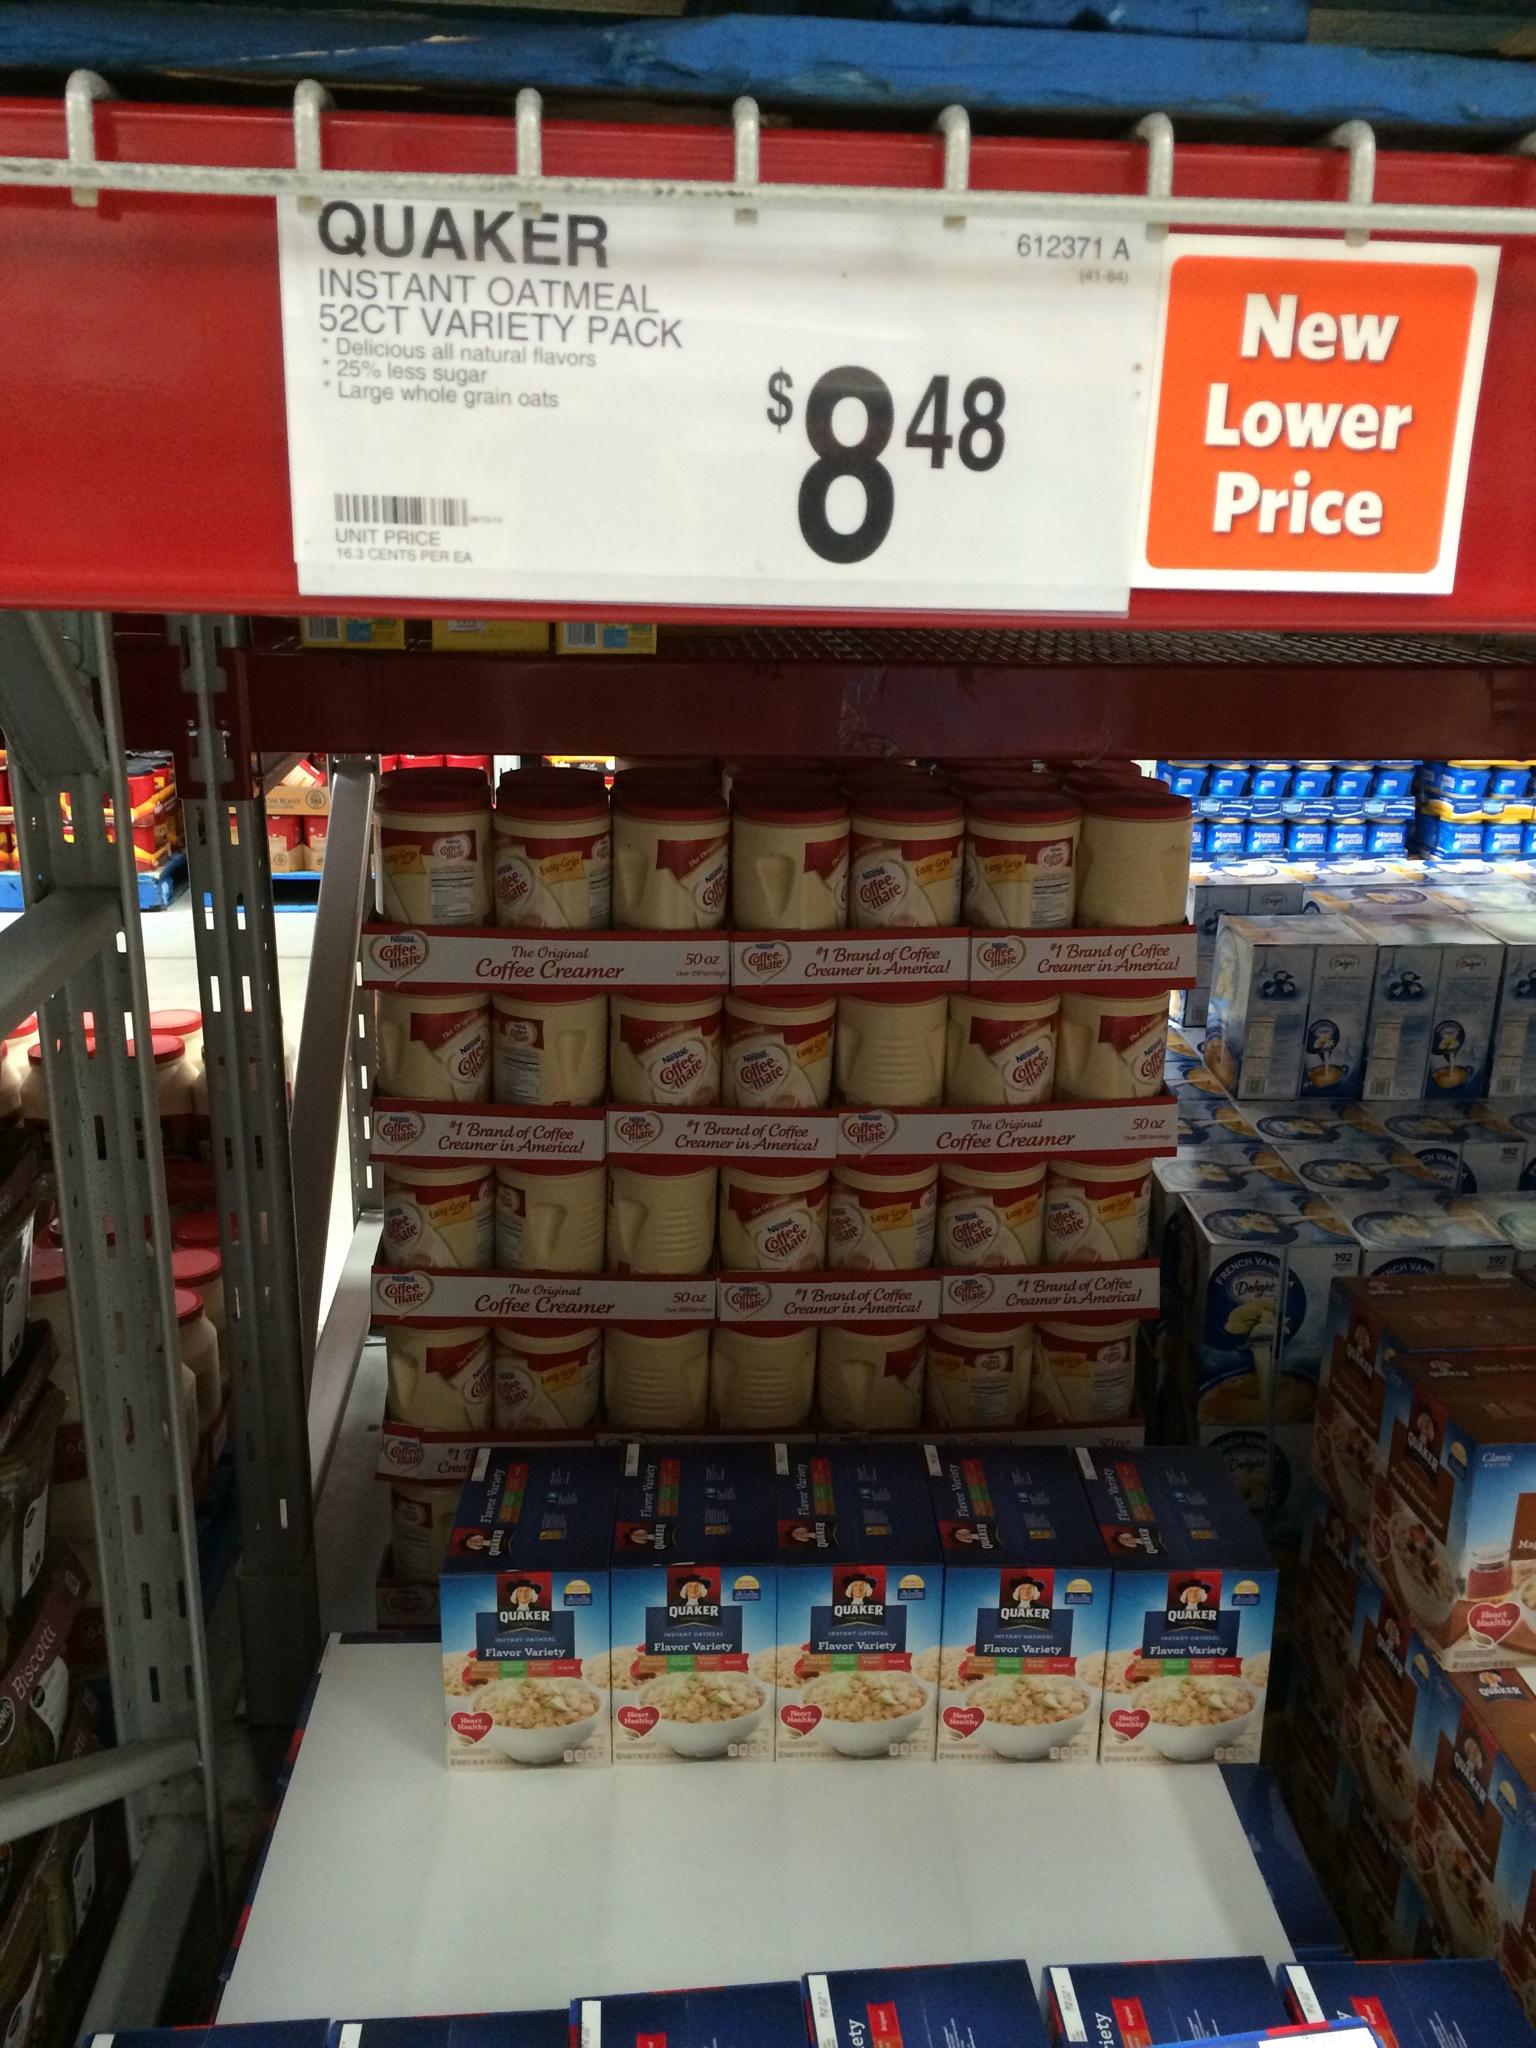 sam s club vs costco prices sam s instant quaker oatmeal 52 ct 8 48 16 each costco instant quaker oatmeal 52 ct 8 55 16 each